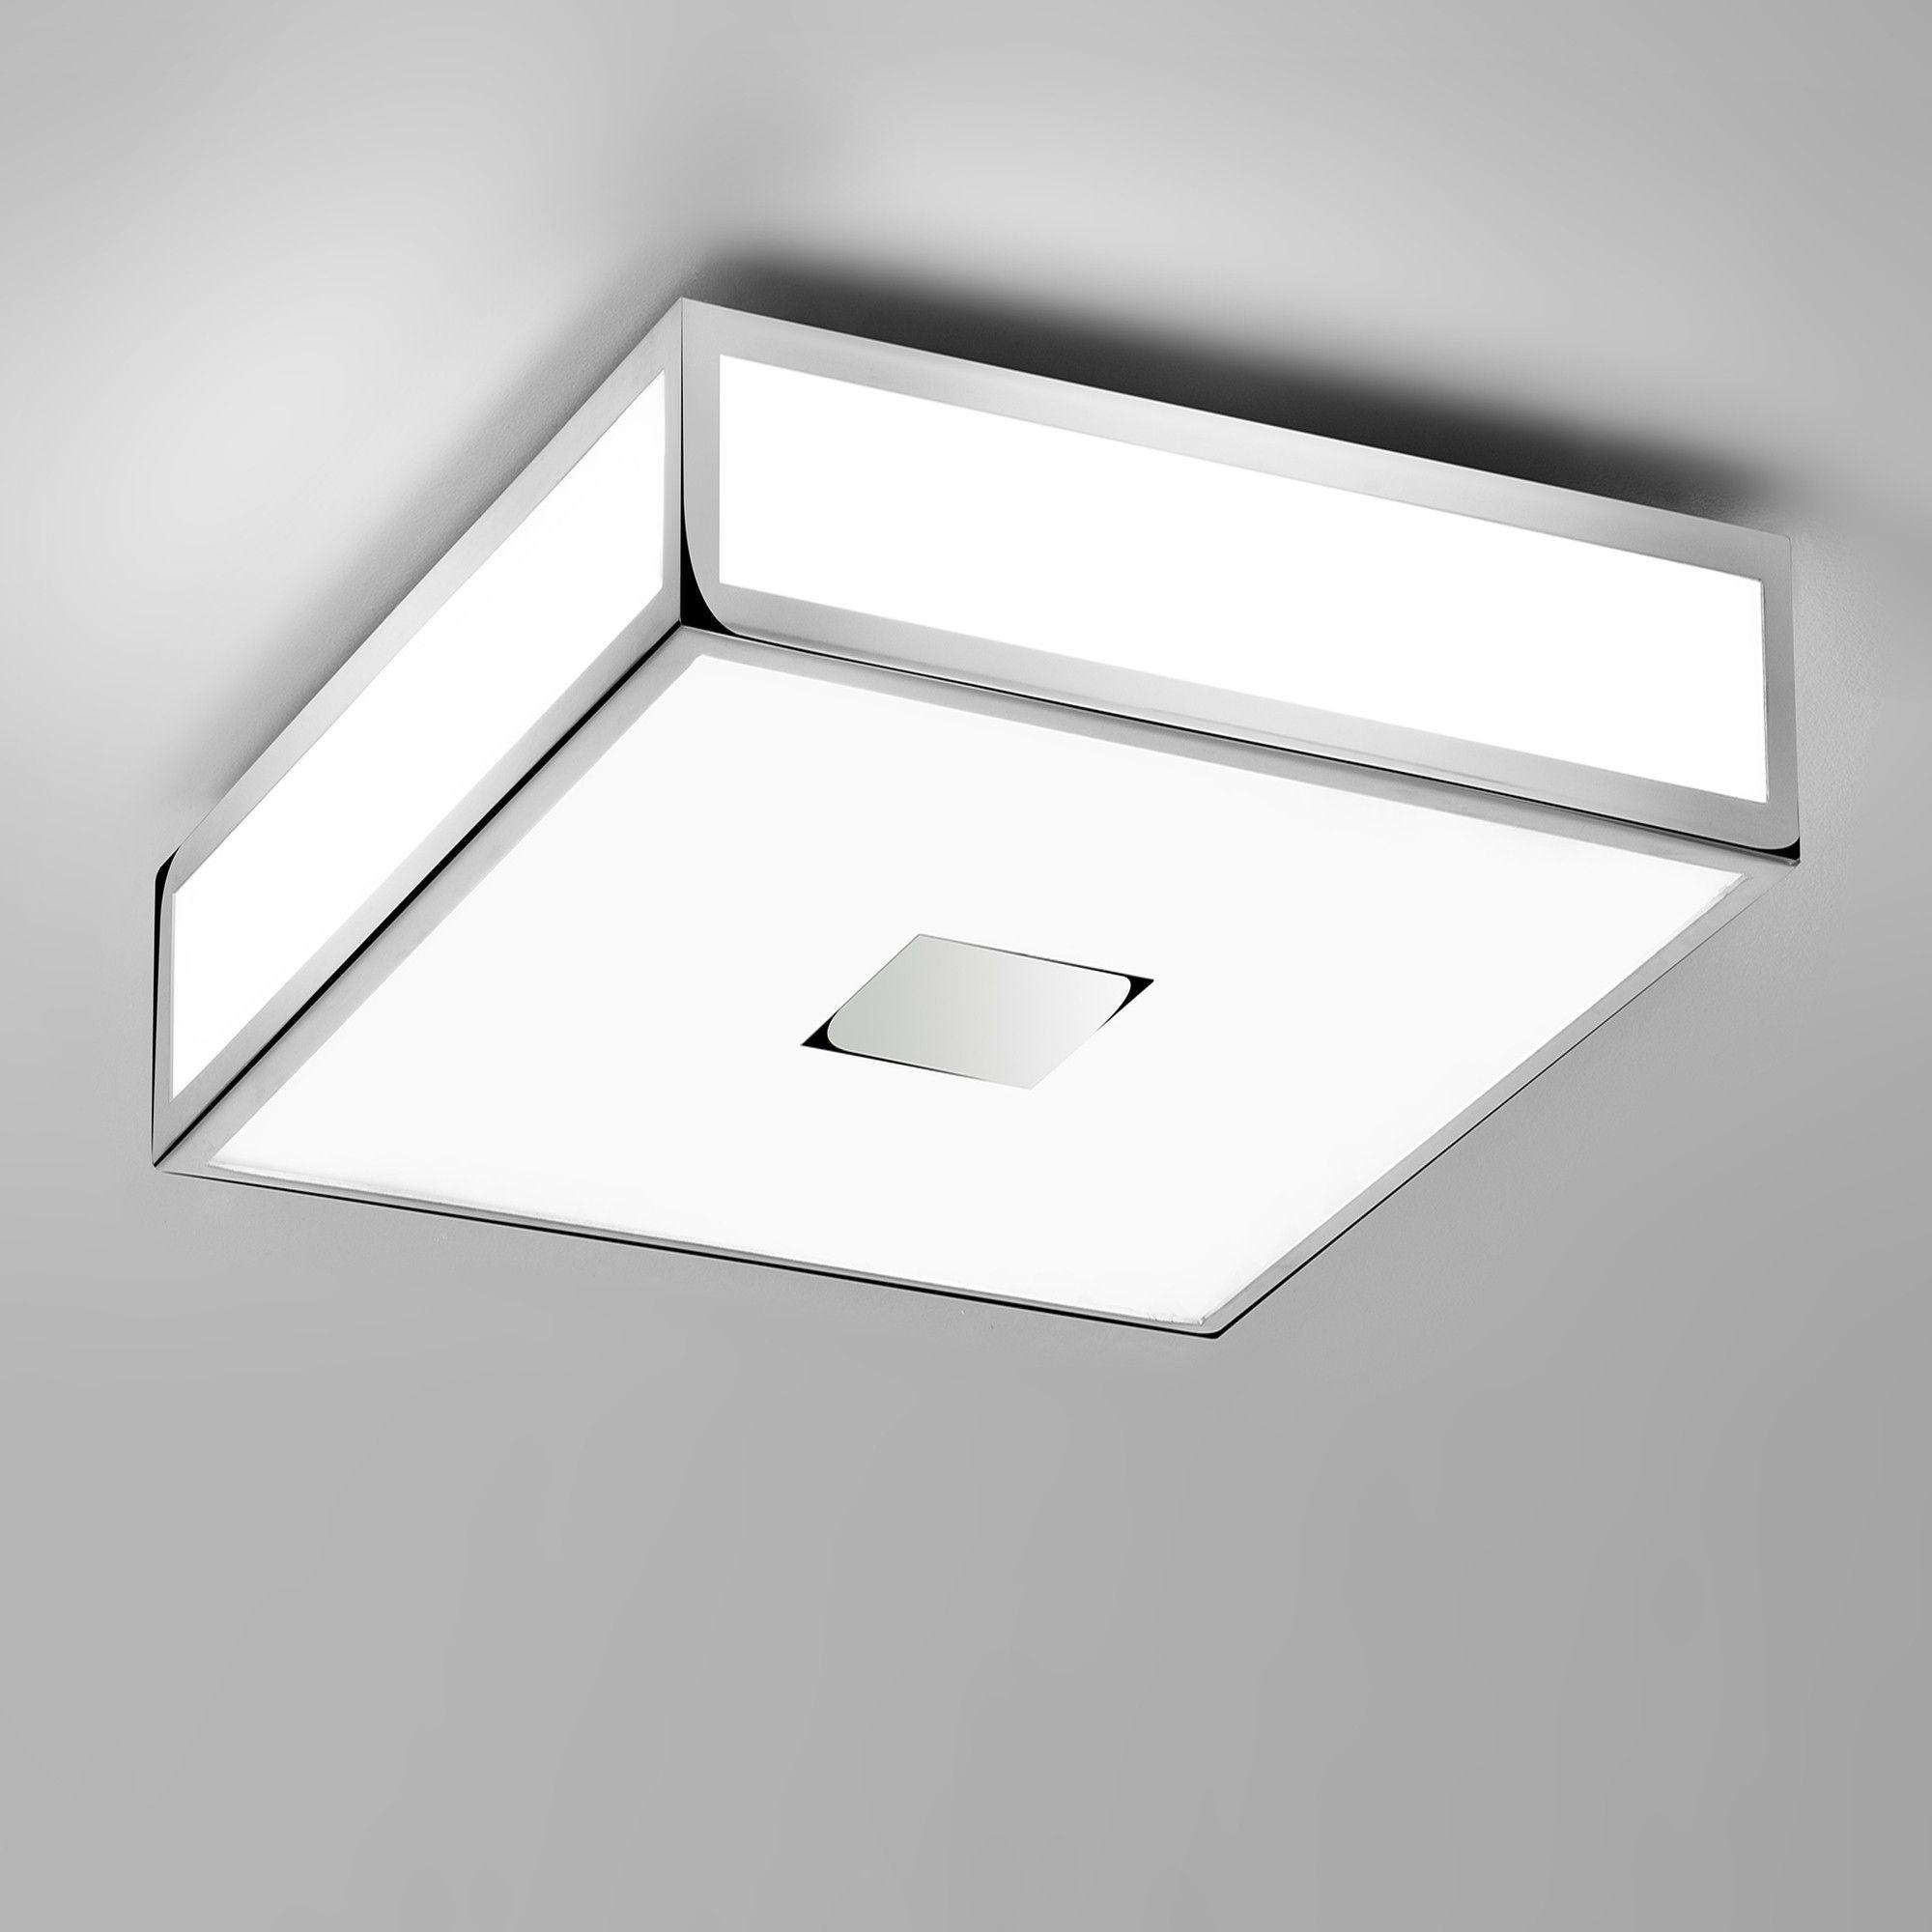 Bathroom exhaust fan bunnings | bathroom design 2017-2018 ...